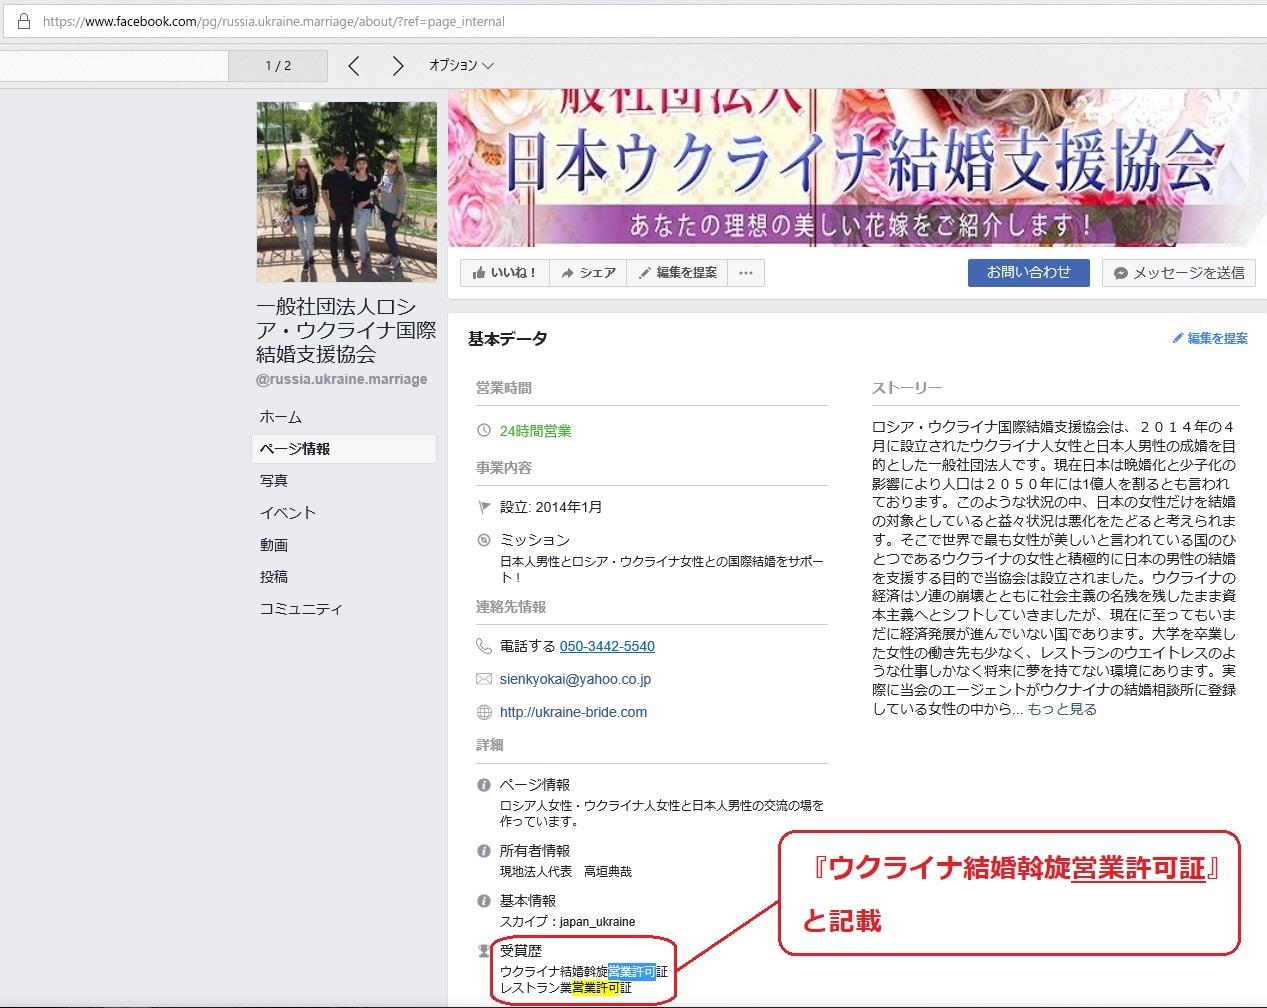 fb_kakudai.jpg